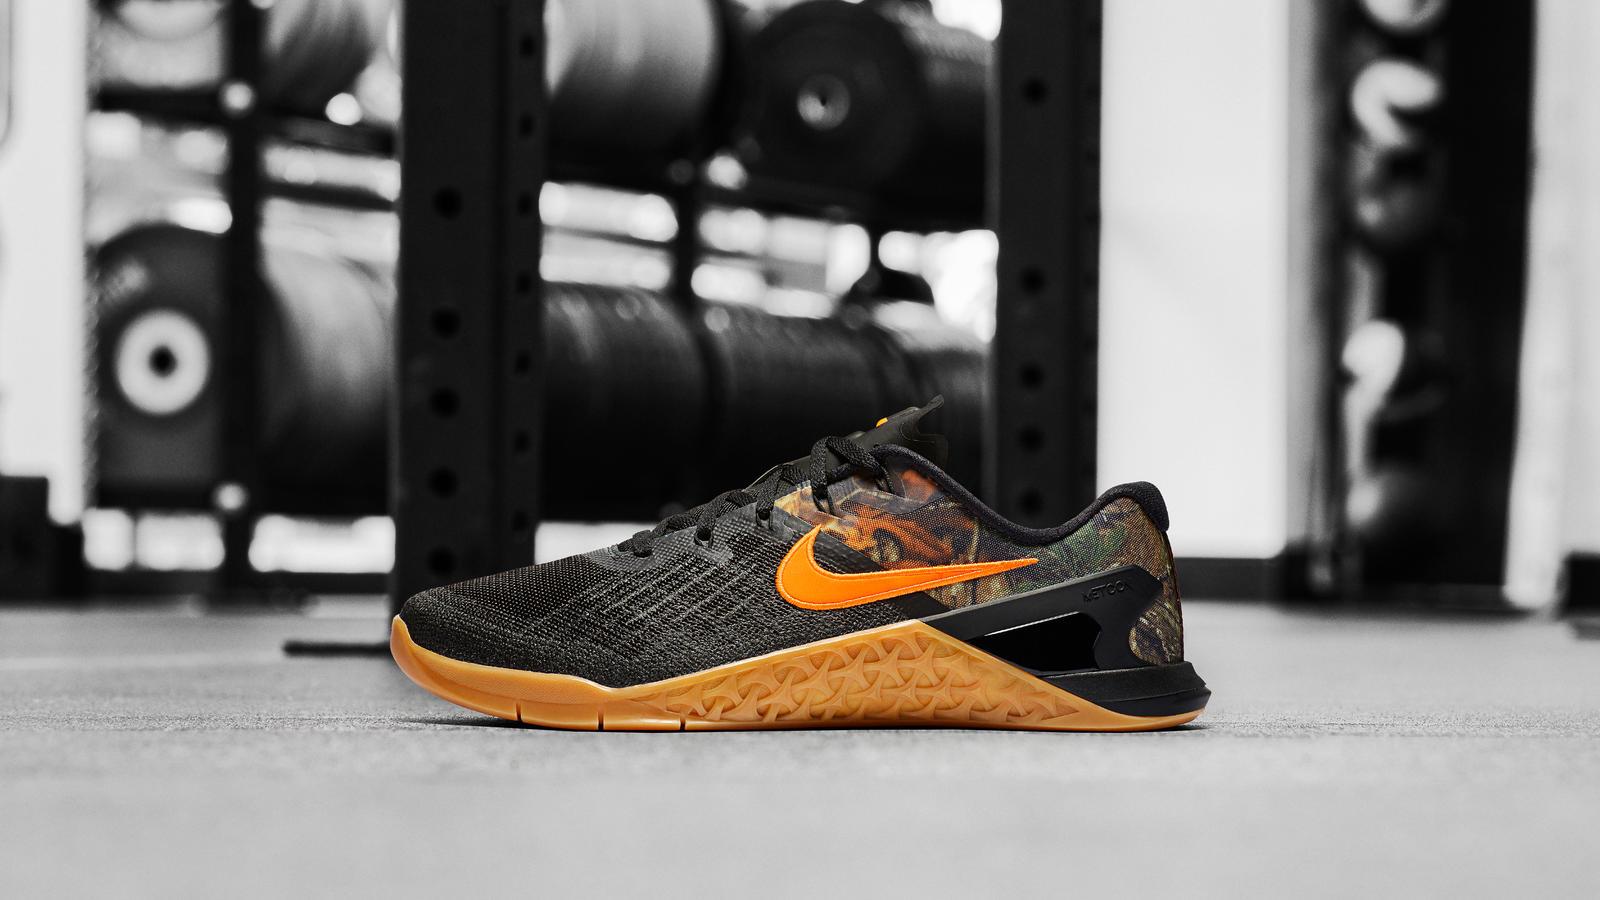 d353169c7d9cbc Nike Metcon 3 Realtree - Nike News